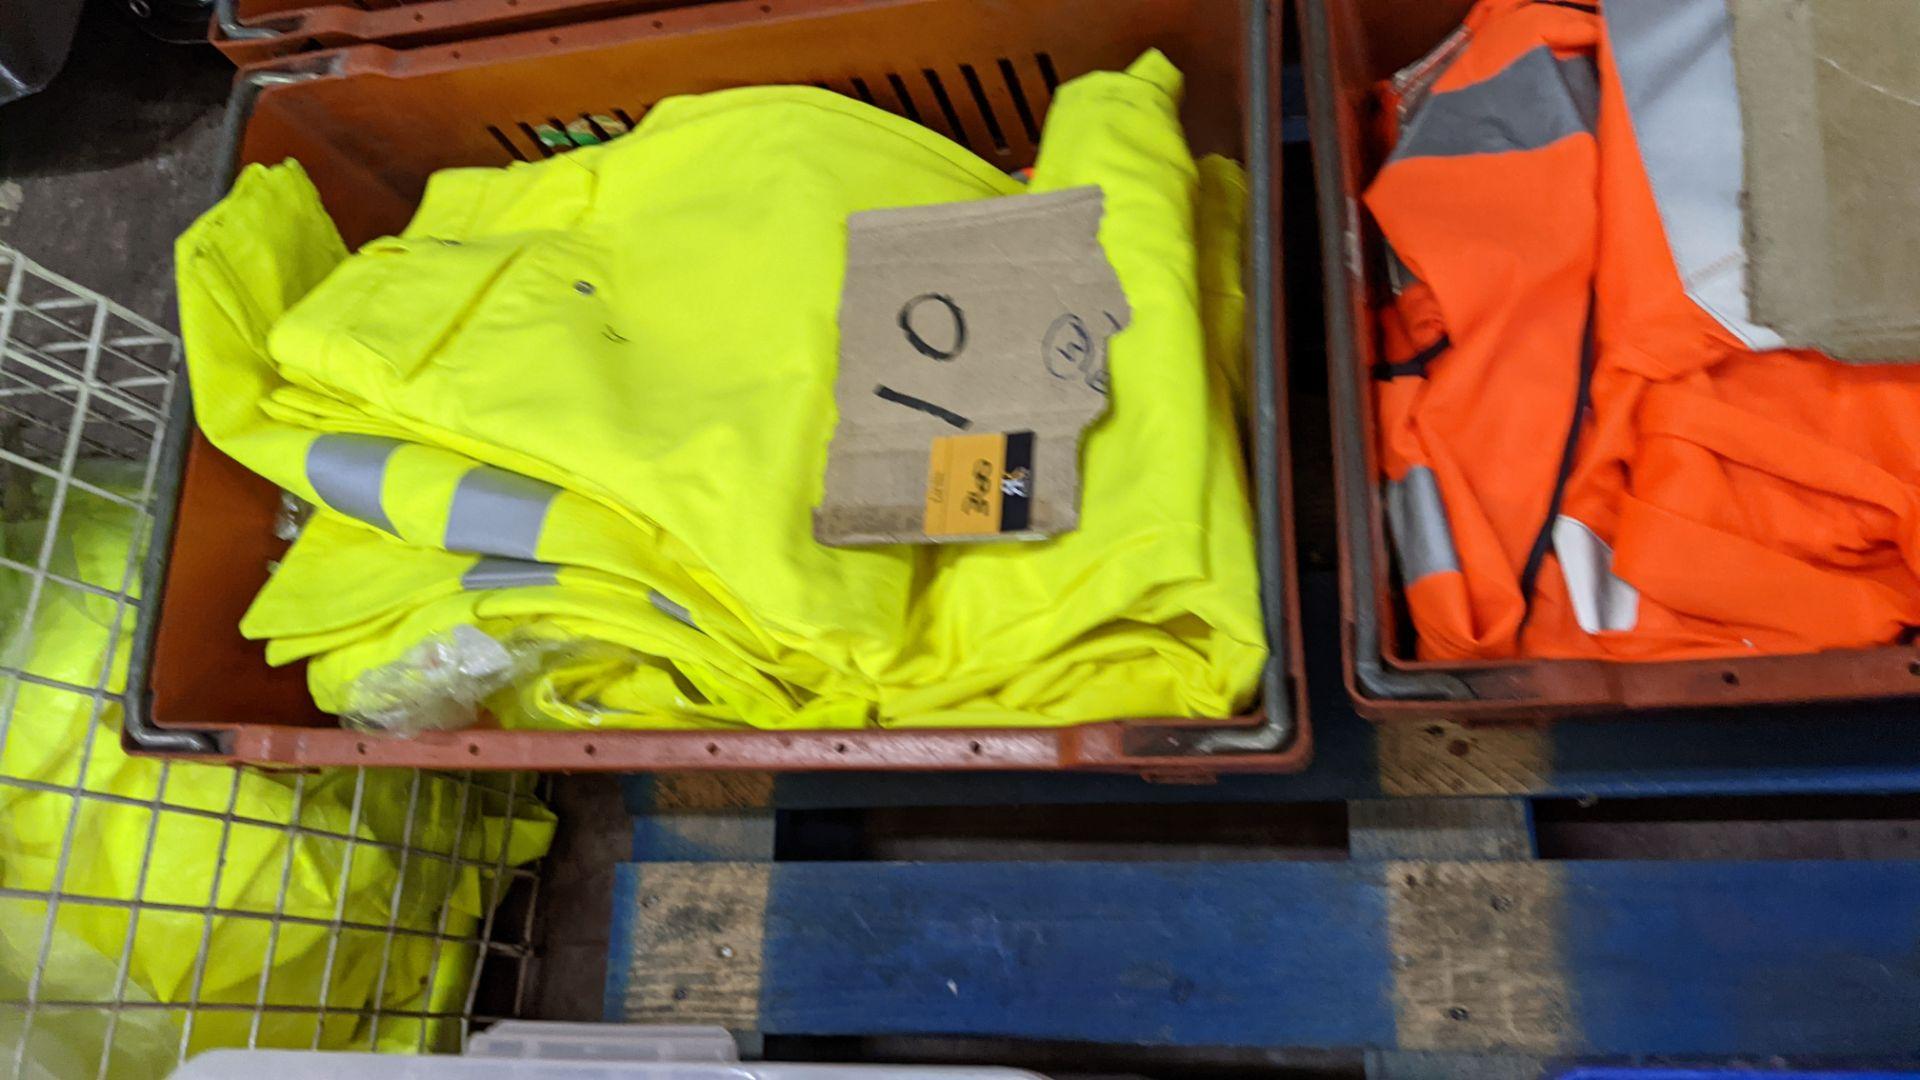 10 off hi-vis trousers in yellow & orange - Image 2 of 4